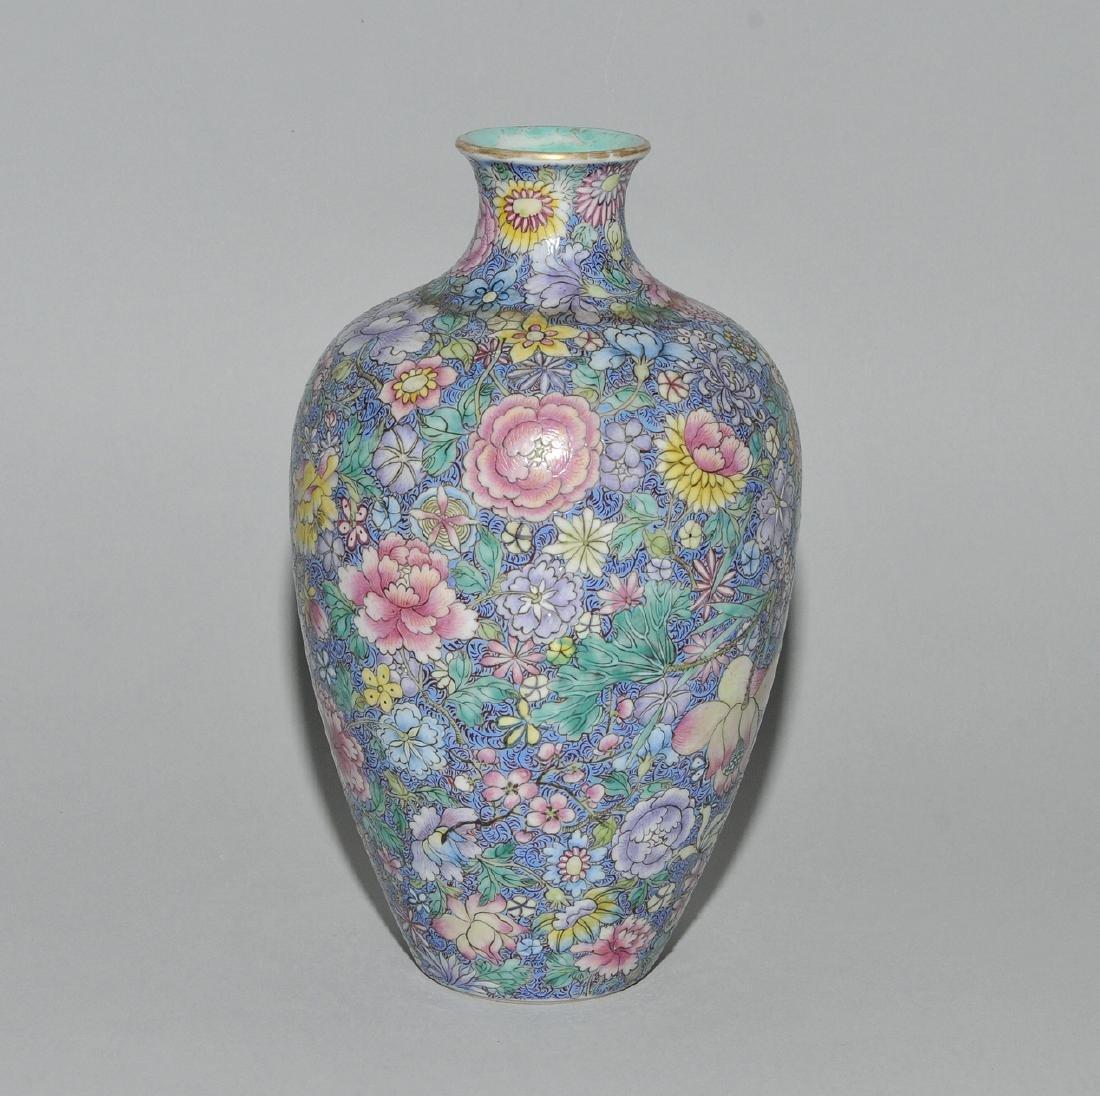 Vase China, 1.Hälfte 20.Jh. Porzellan. Eisenrote - 4